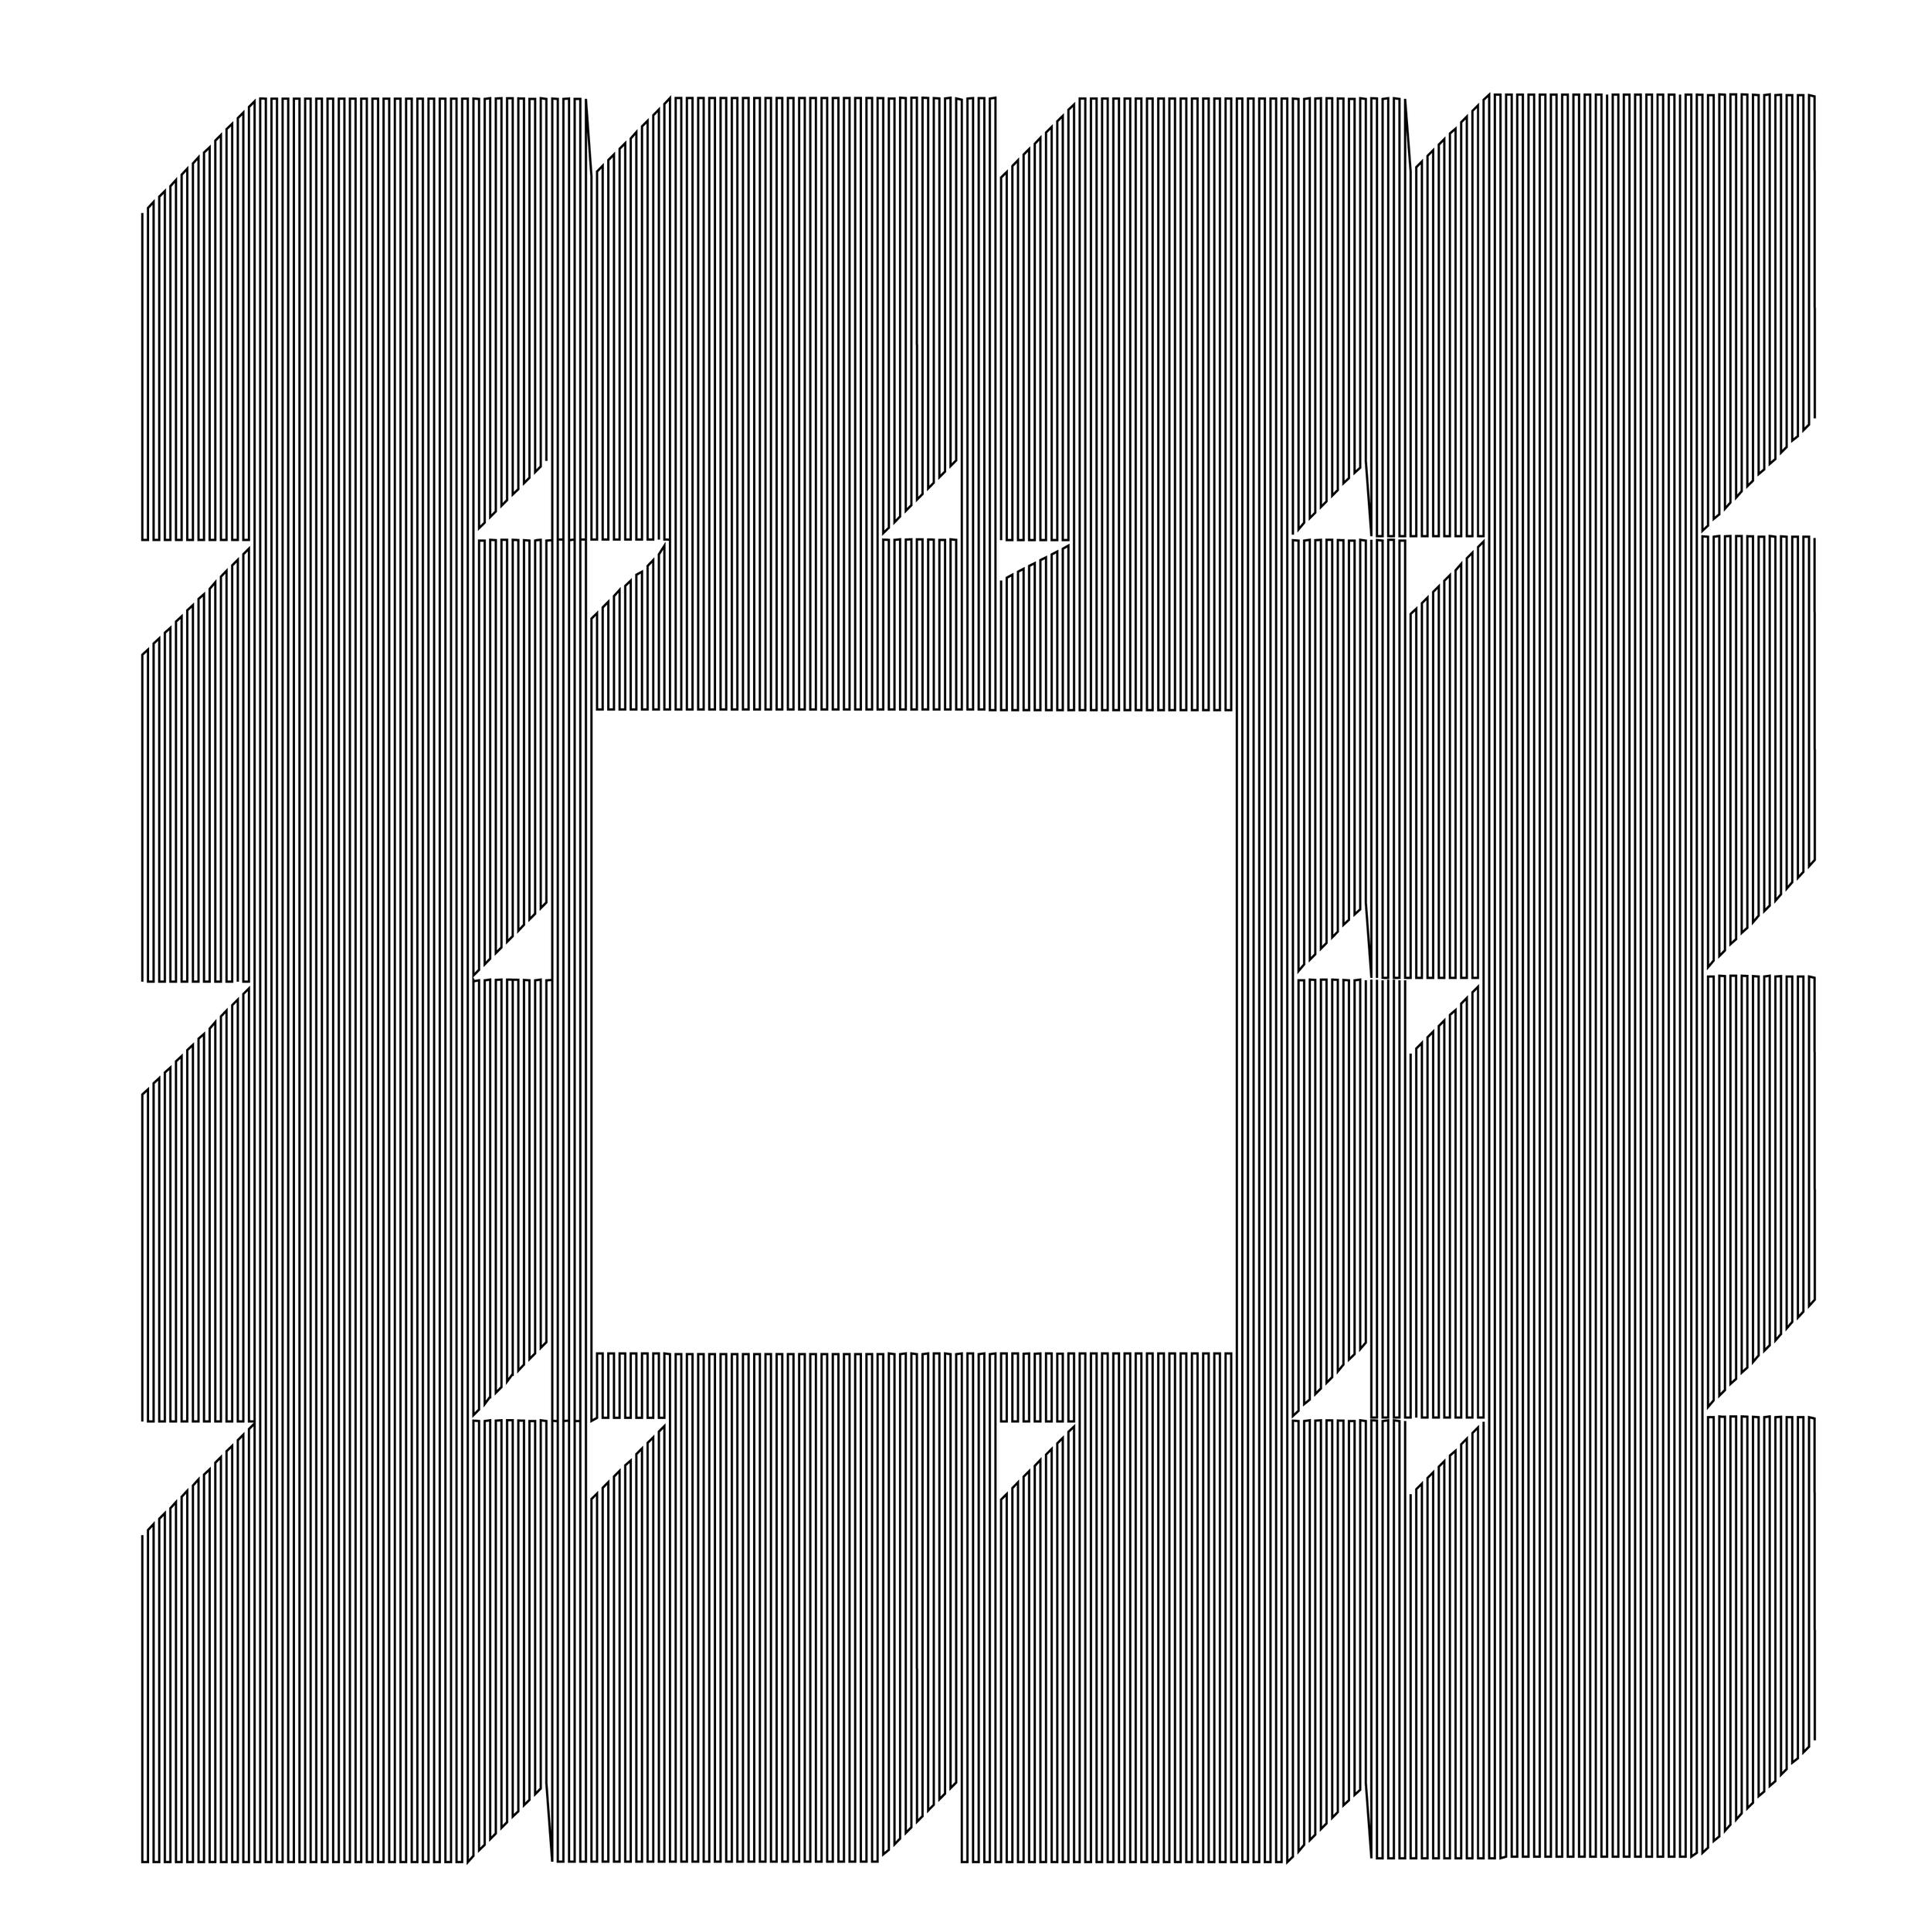 nuclear-_Artboard 9 copy.png